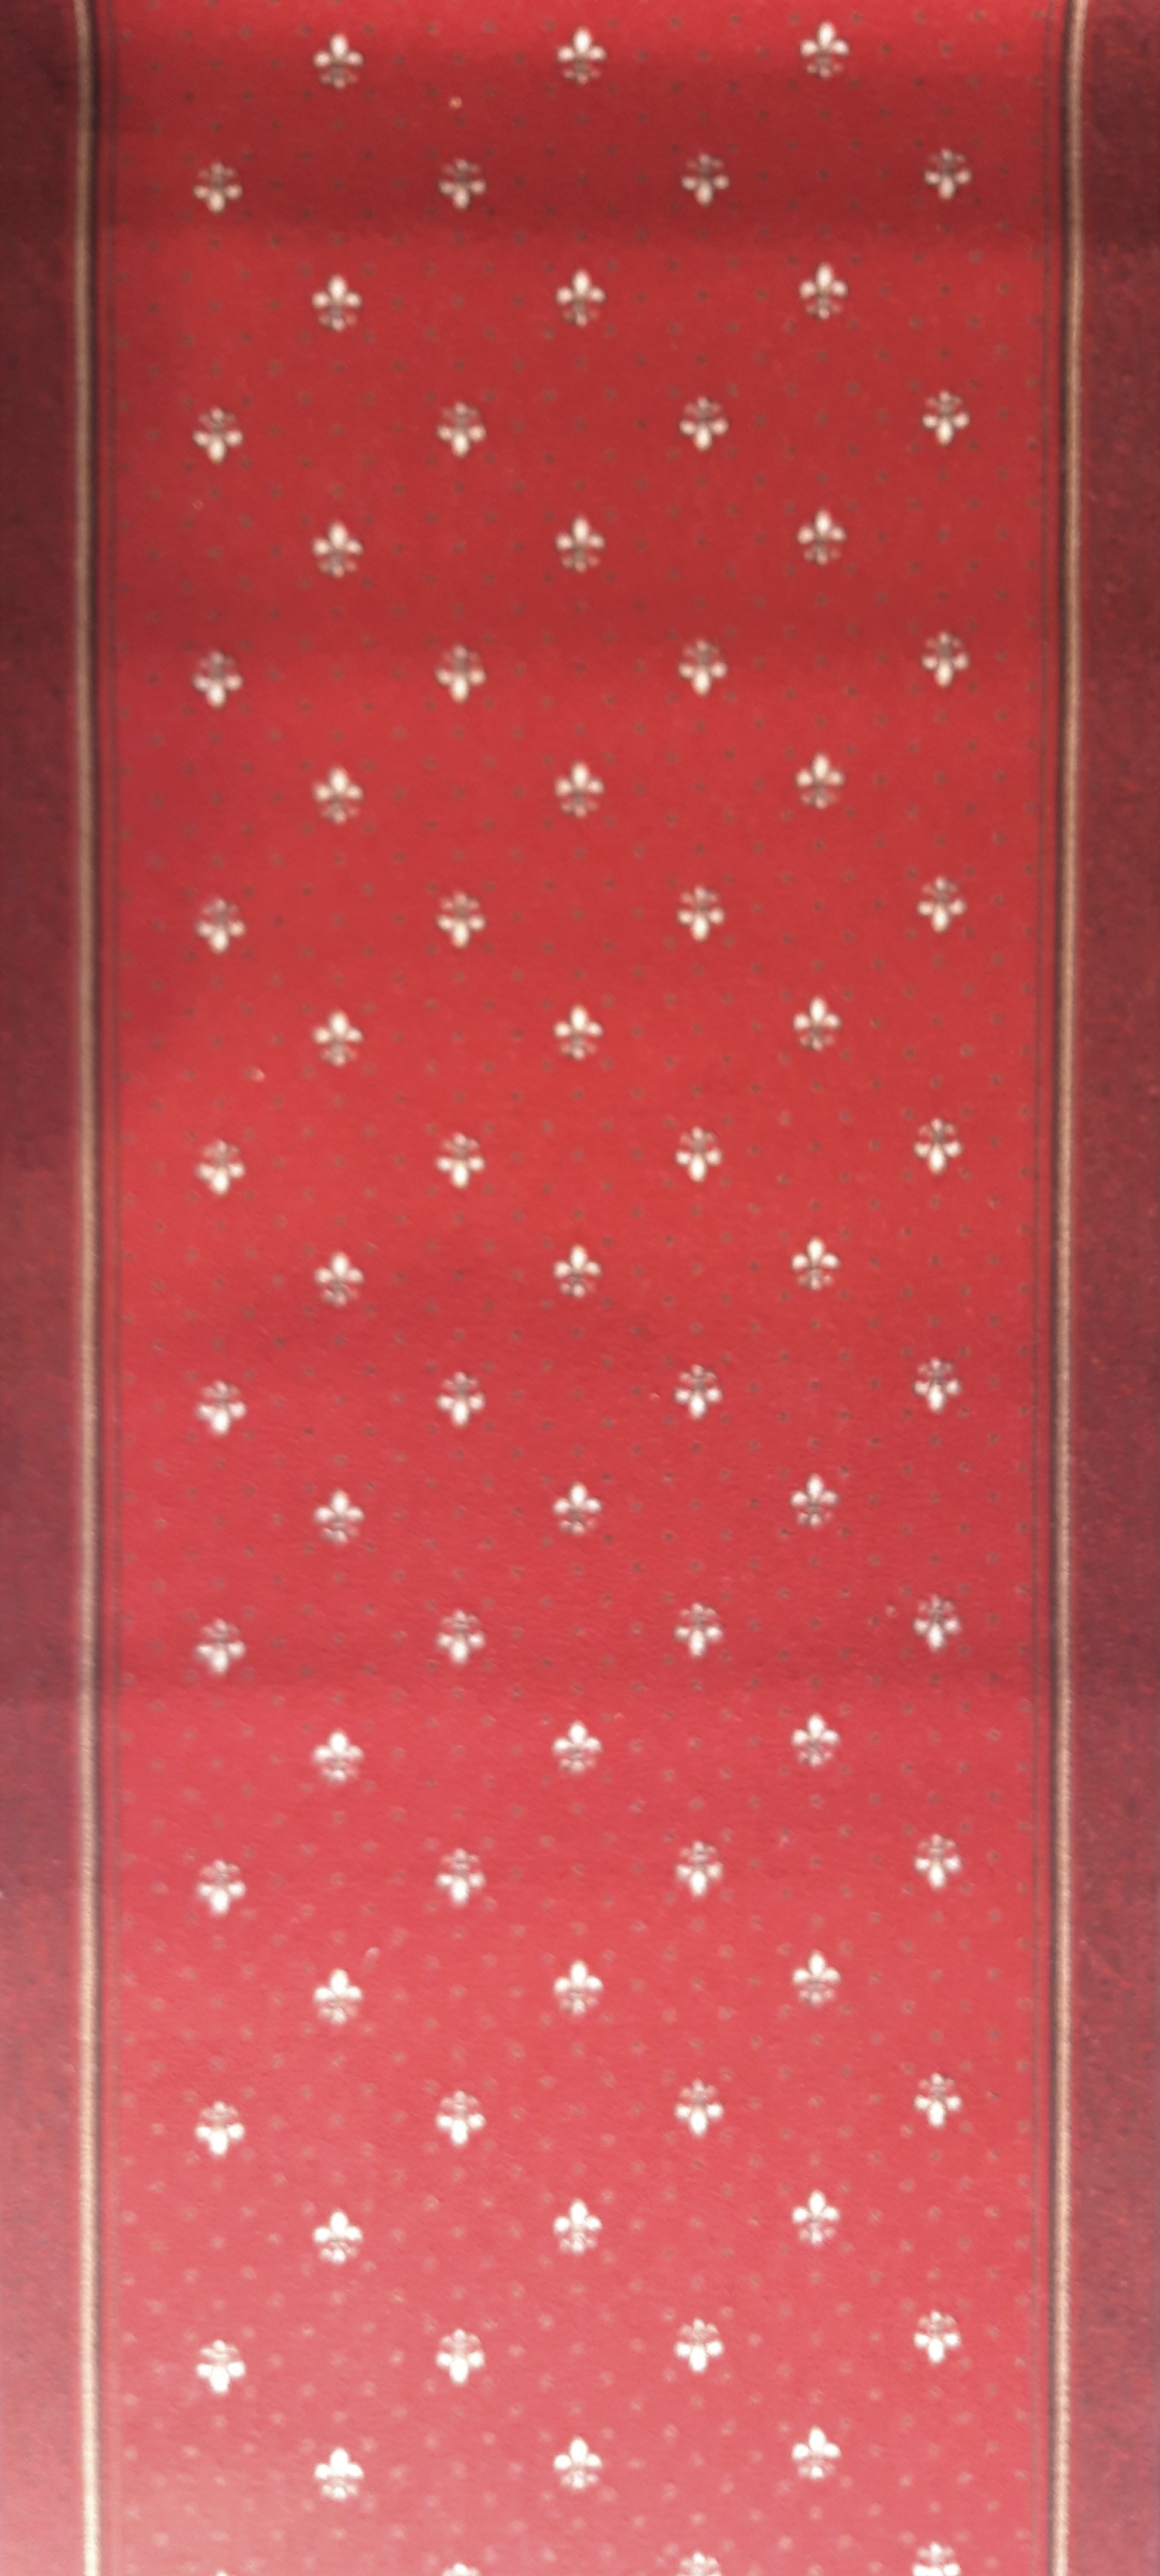 Traversa Tesatura Plata 1835, Rosu, 100x400 cm, 820 gr/mp 1